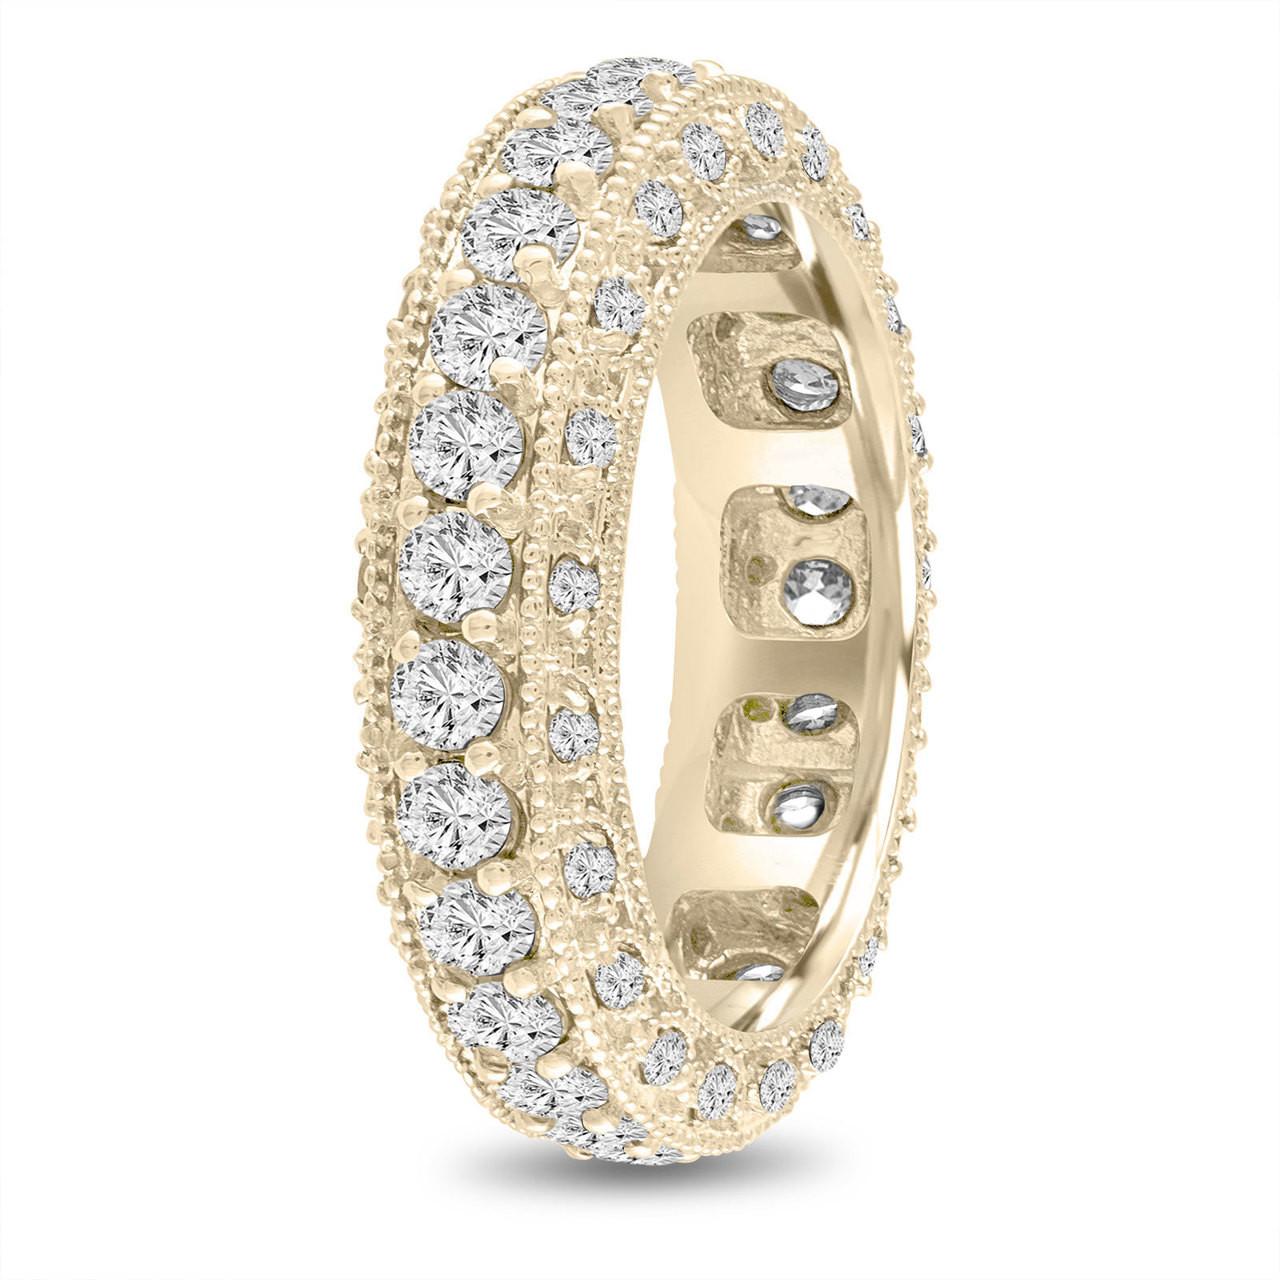 Unique Wedding Ring.Eternity Diamond Wedding Band Yellow Gold Mens Diamond Wedding Ring Vintage Wedding Band 6 Mm Unique Wedding Band 2 50 Carat Handmade